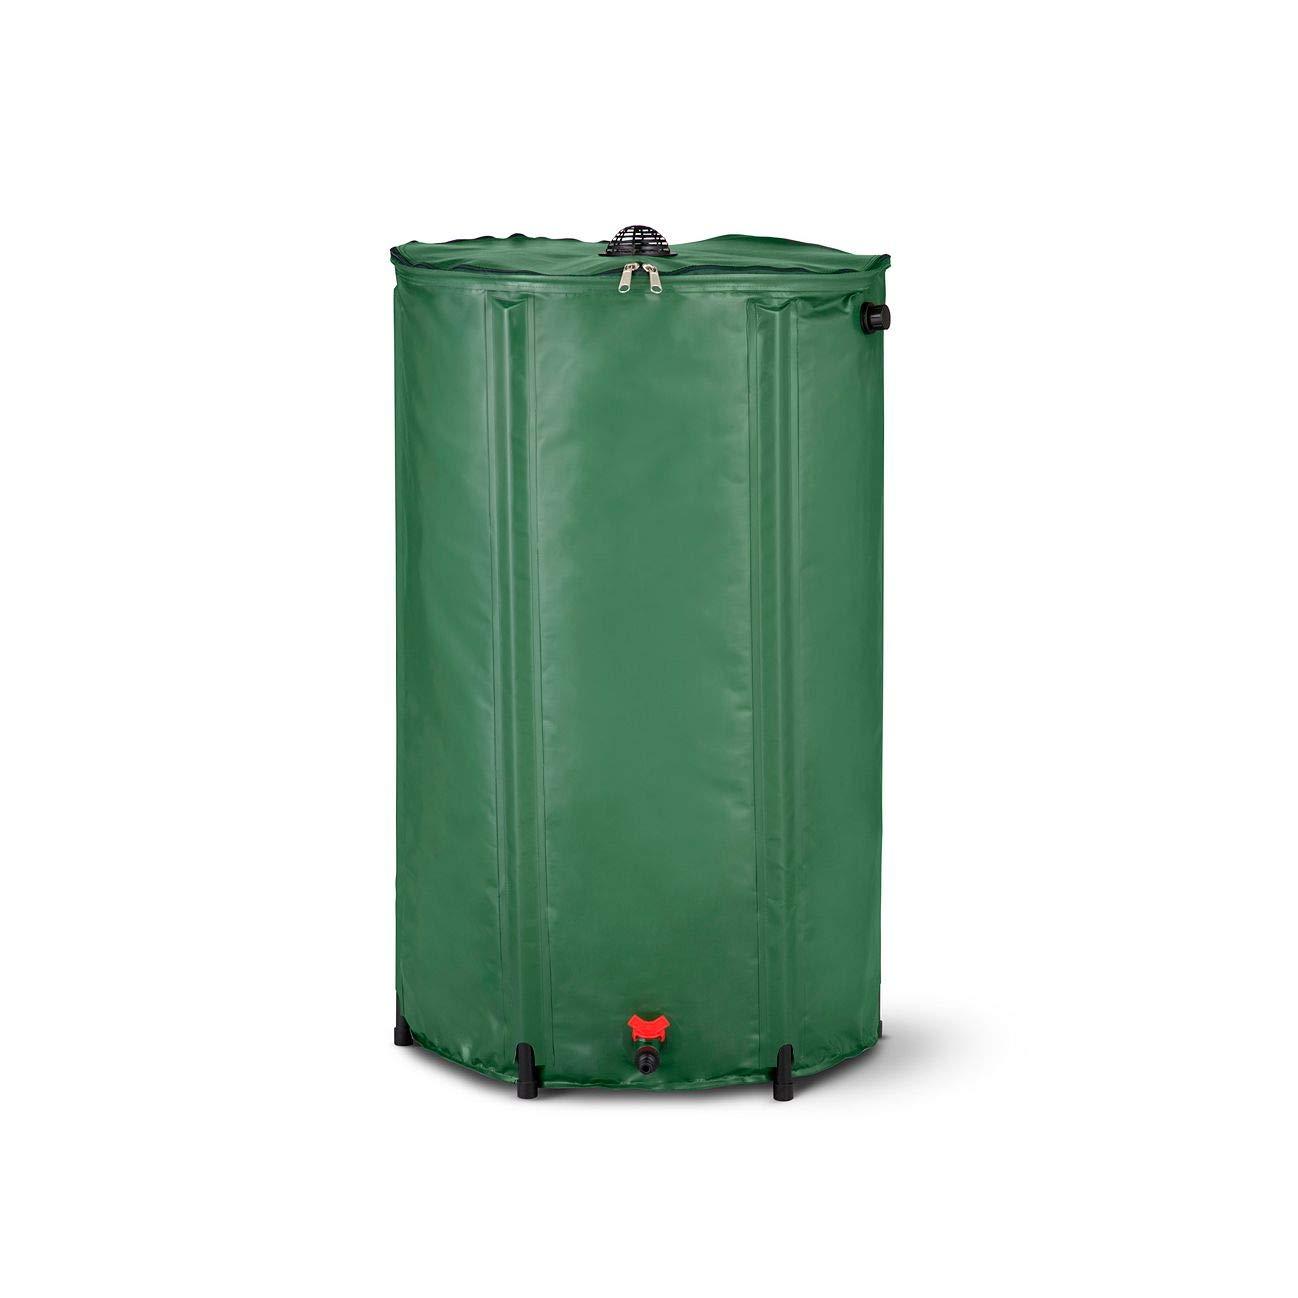 HSN Collapsible Rain Barrel Water Storage - 74 Gallon